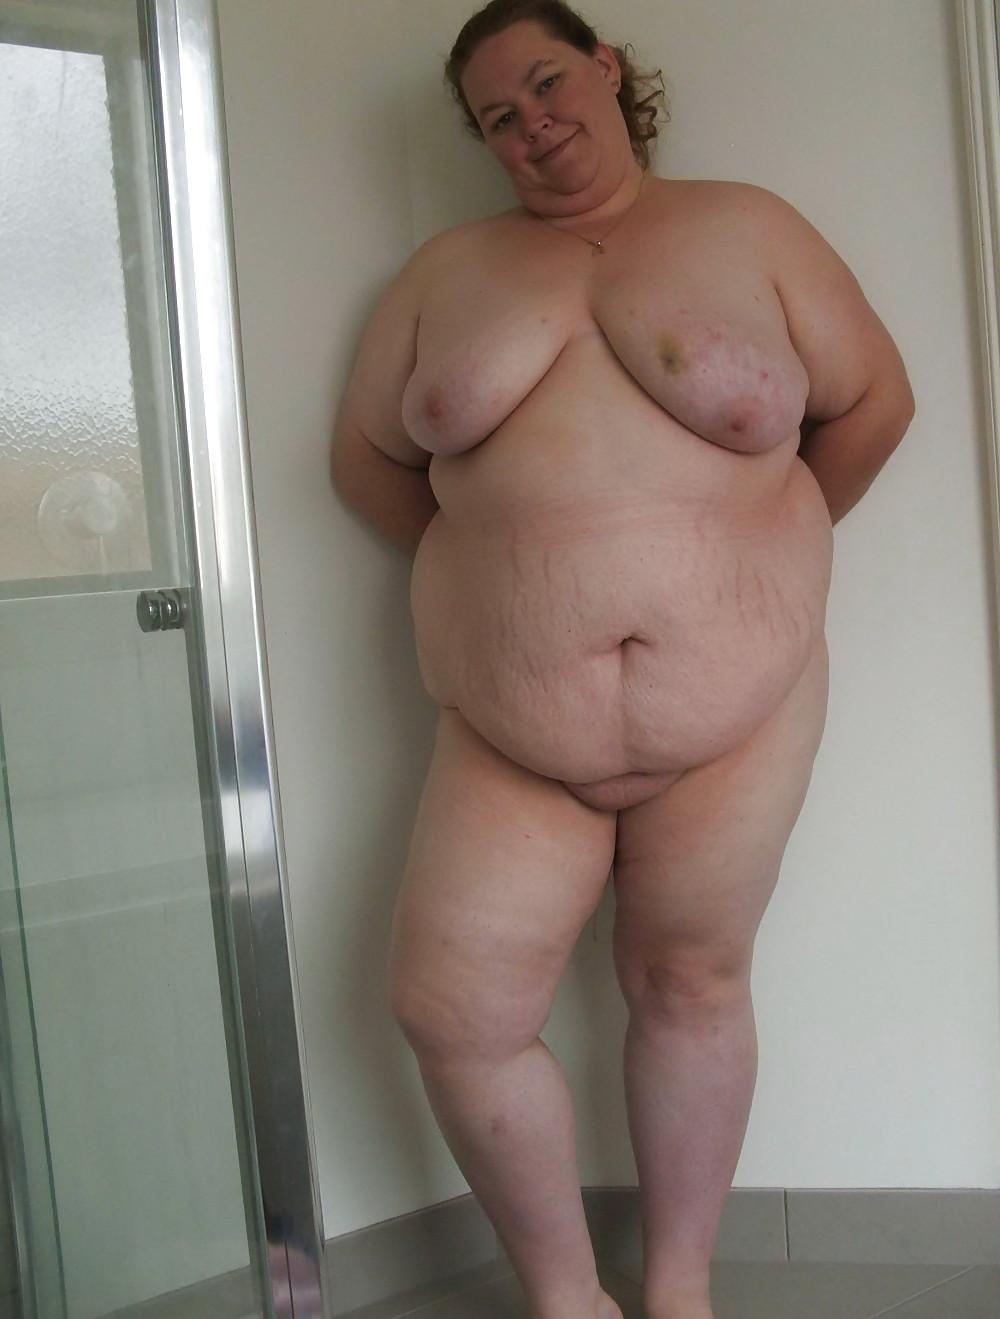 Morbidly obese people naked, fotos porno sensual club